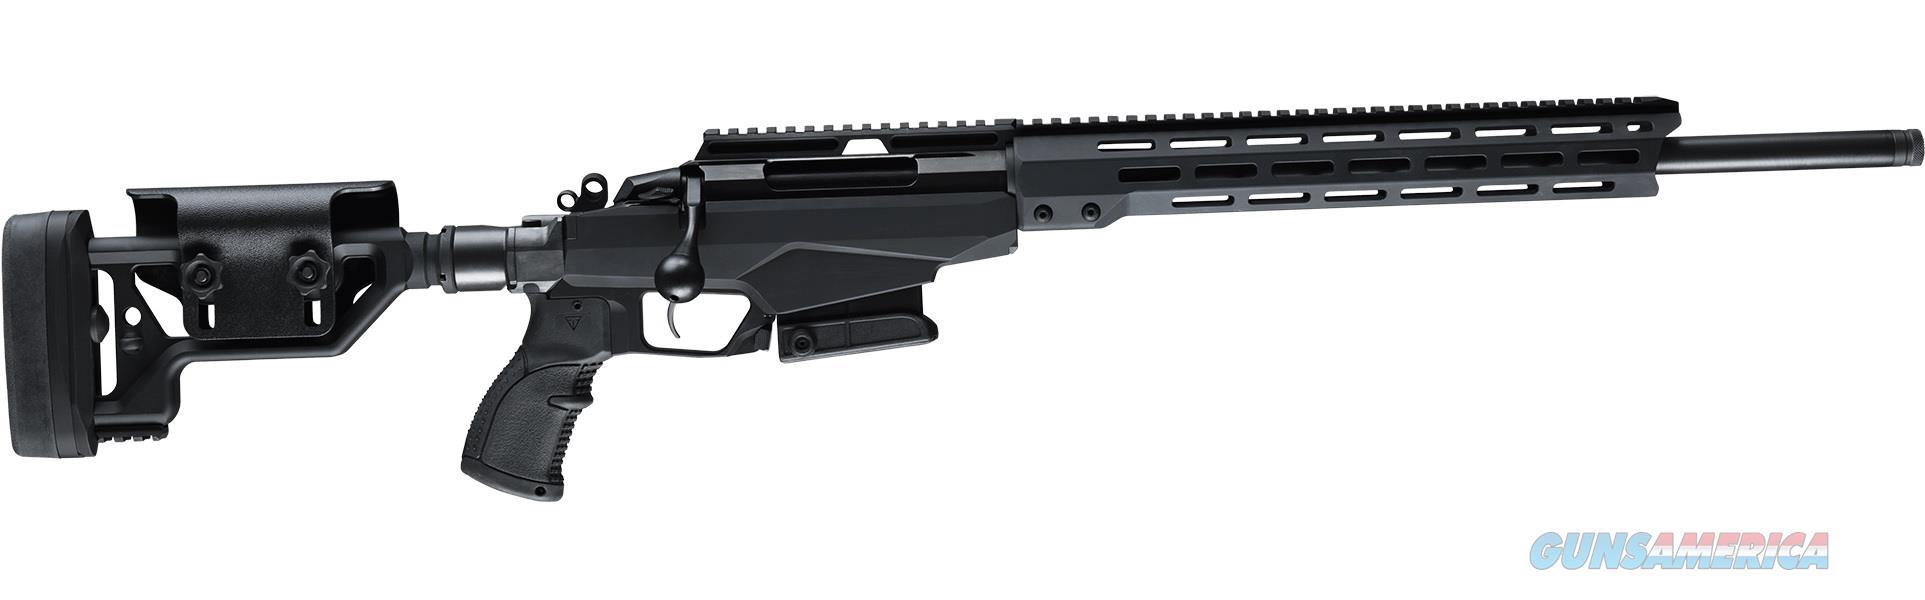 "Tikka T3x TAC A1 .260 Remington 24"" TB 10 Rds JRTAC321L   Guns > Rifles > Tikka Rifles > T3"